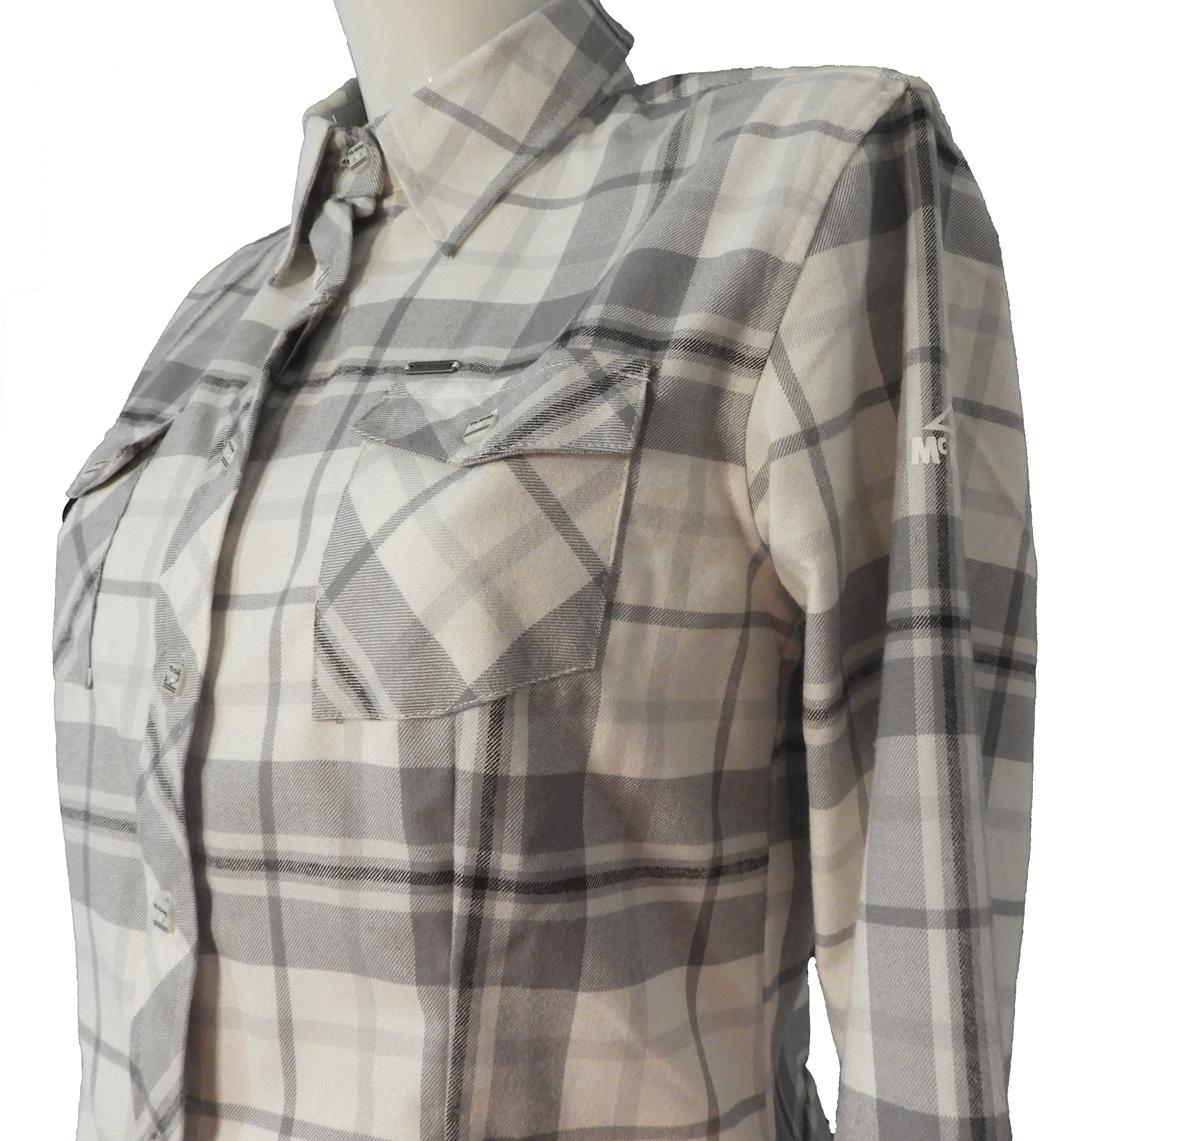 McKinley Damenbluse - Damen Bluse langarm - Wandern-Outdoor - 189468